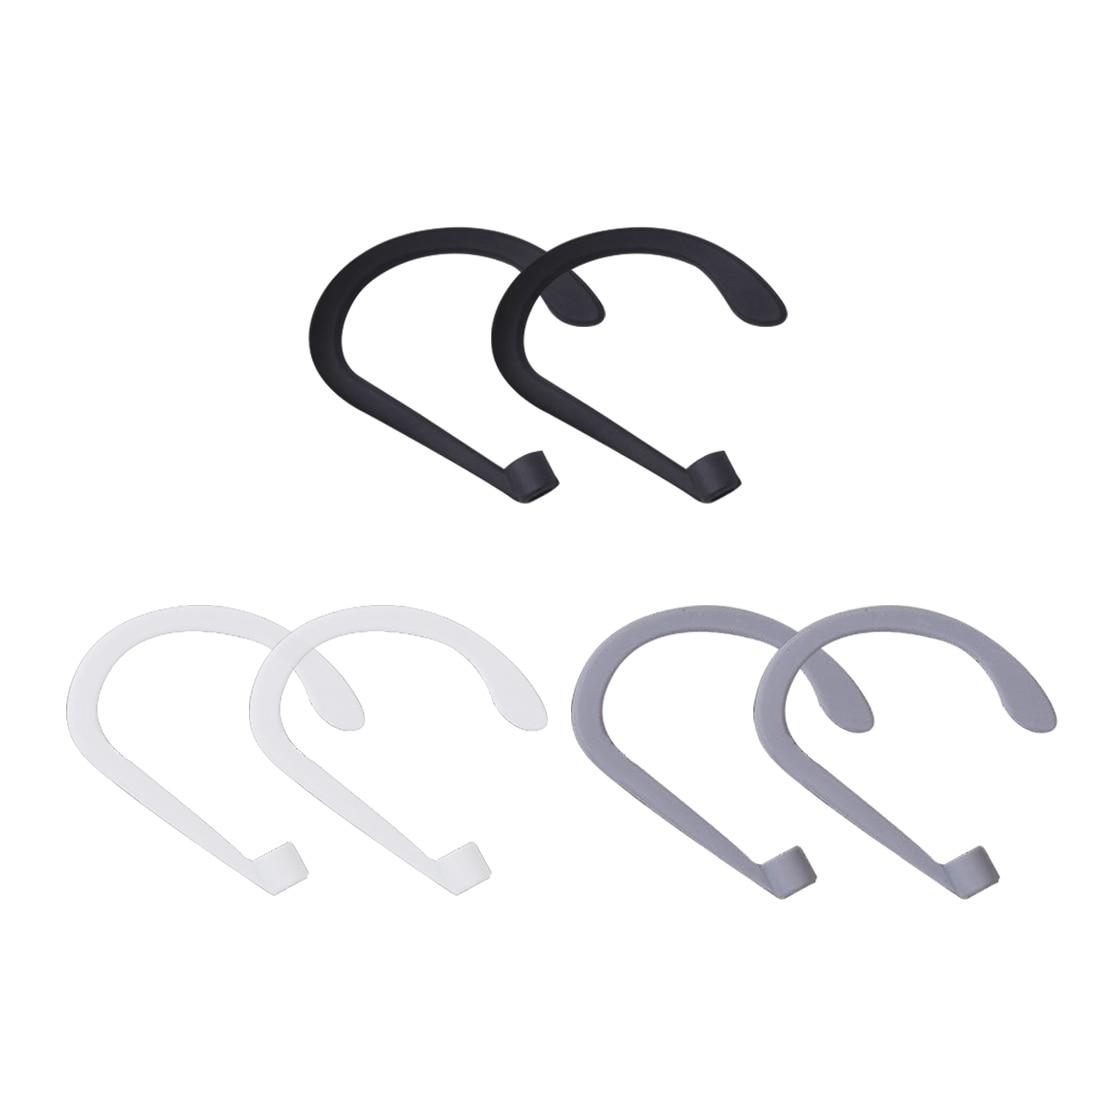 Silicone Earbuds Earphone Holder Ear Hooks for Apple Airpods Earhook Ear Holder Bluetooth Wireless Headphone fone de ouvido in Earphone Accessories from Consumer Electronics